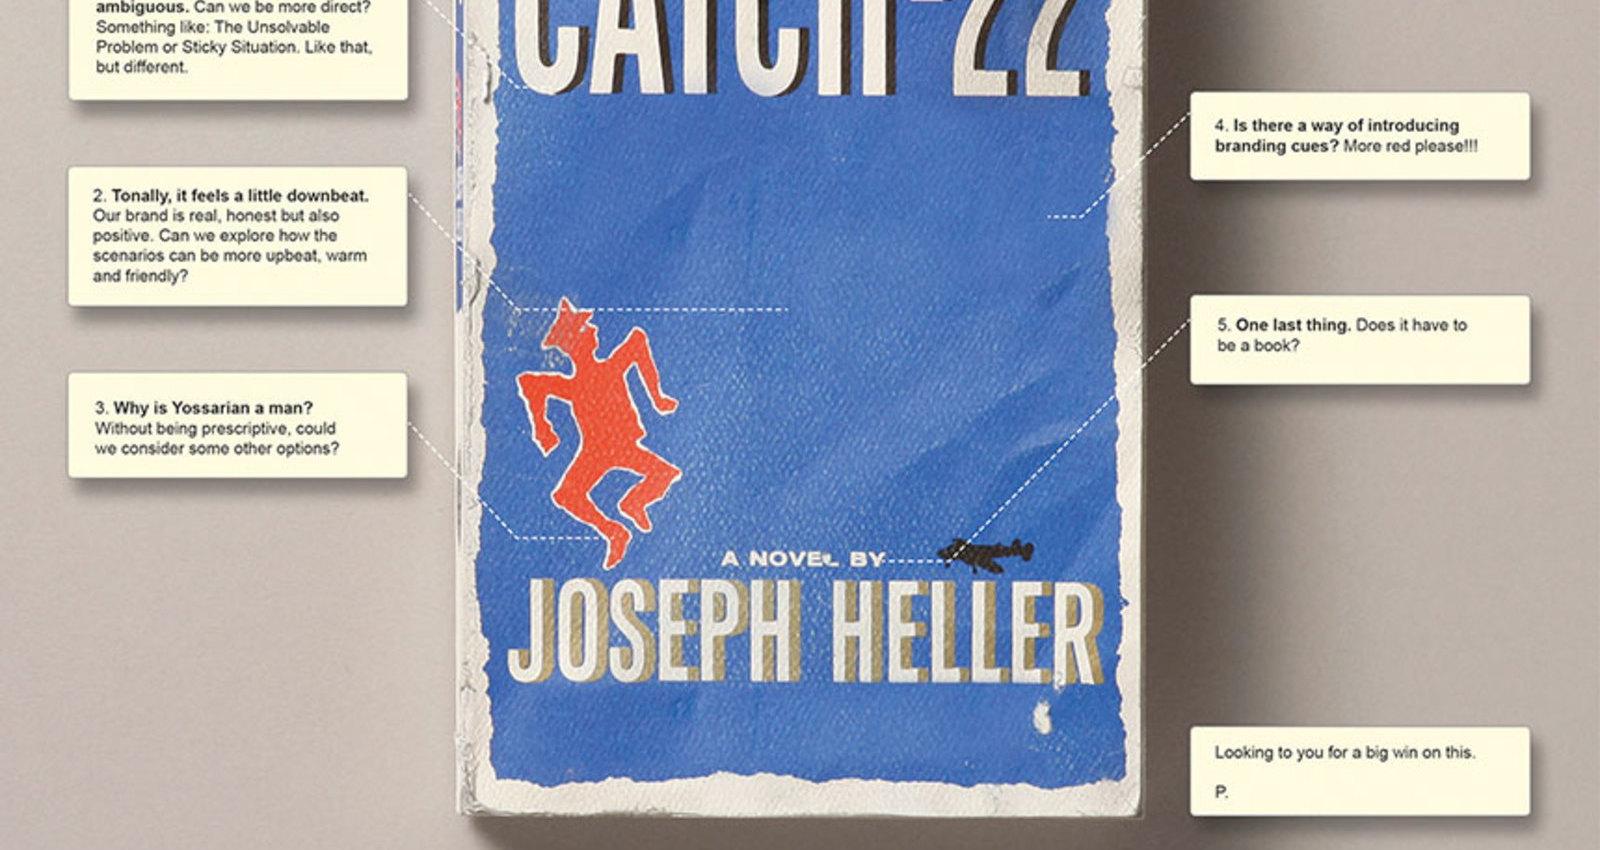 Winston Fletcher 'Catch 22'